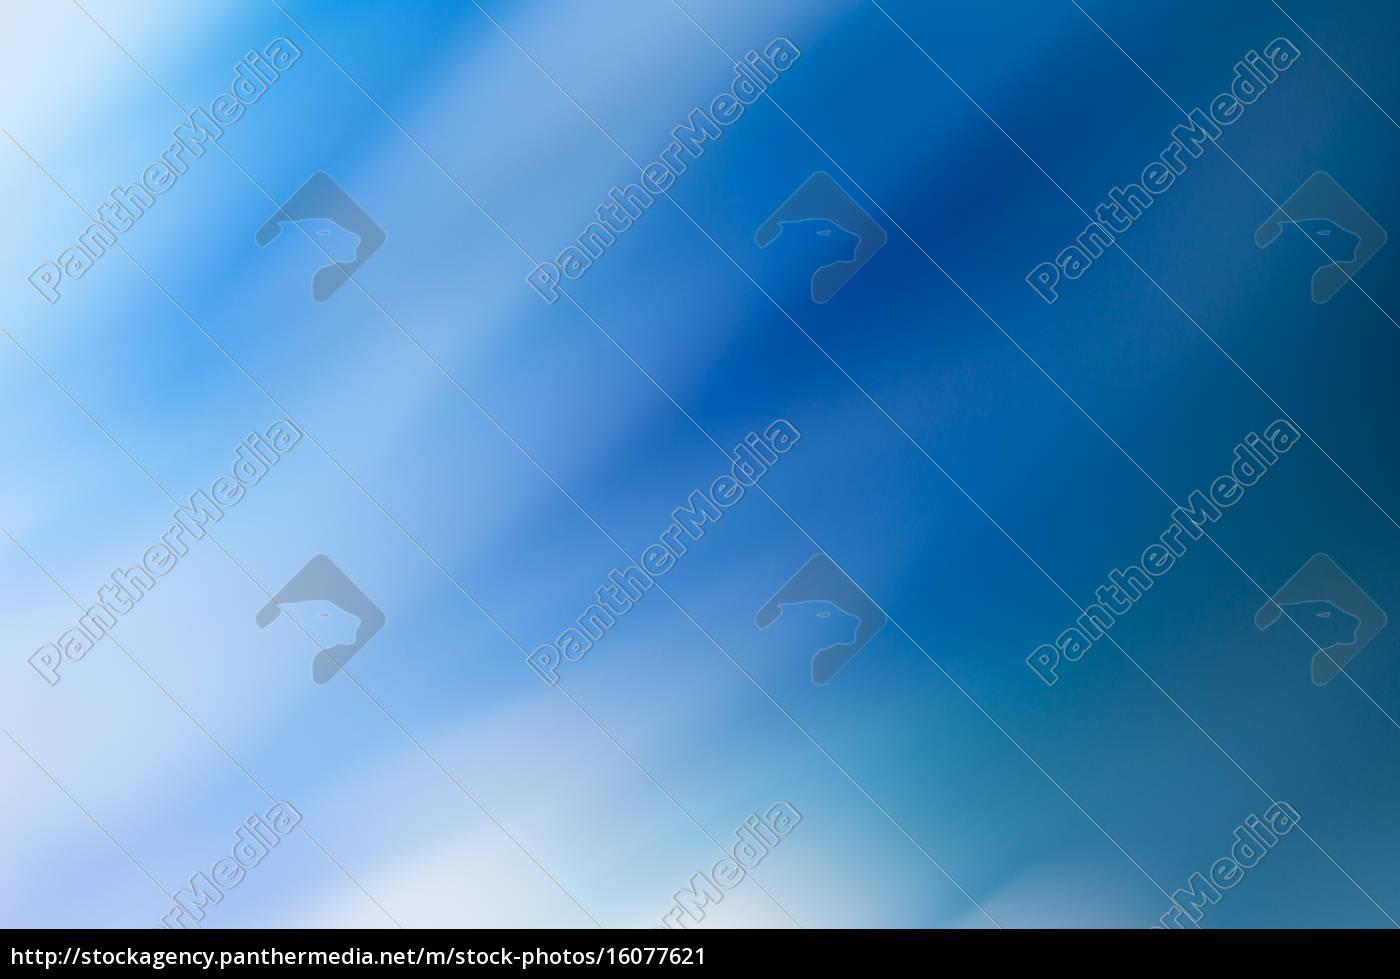 blue, blurred, background - 16077621